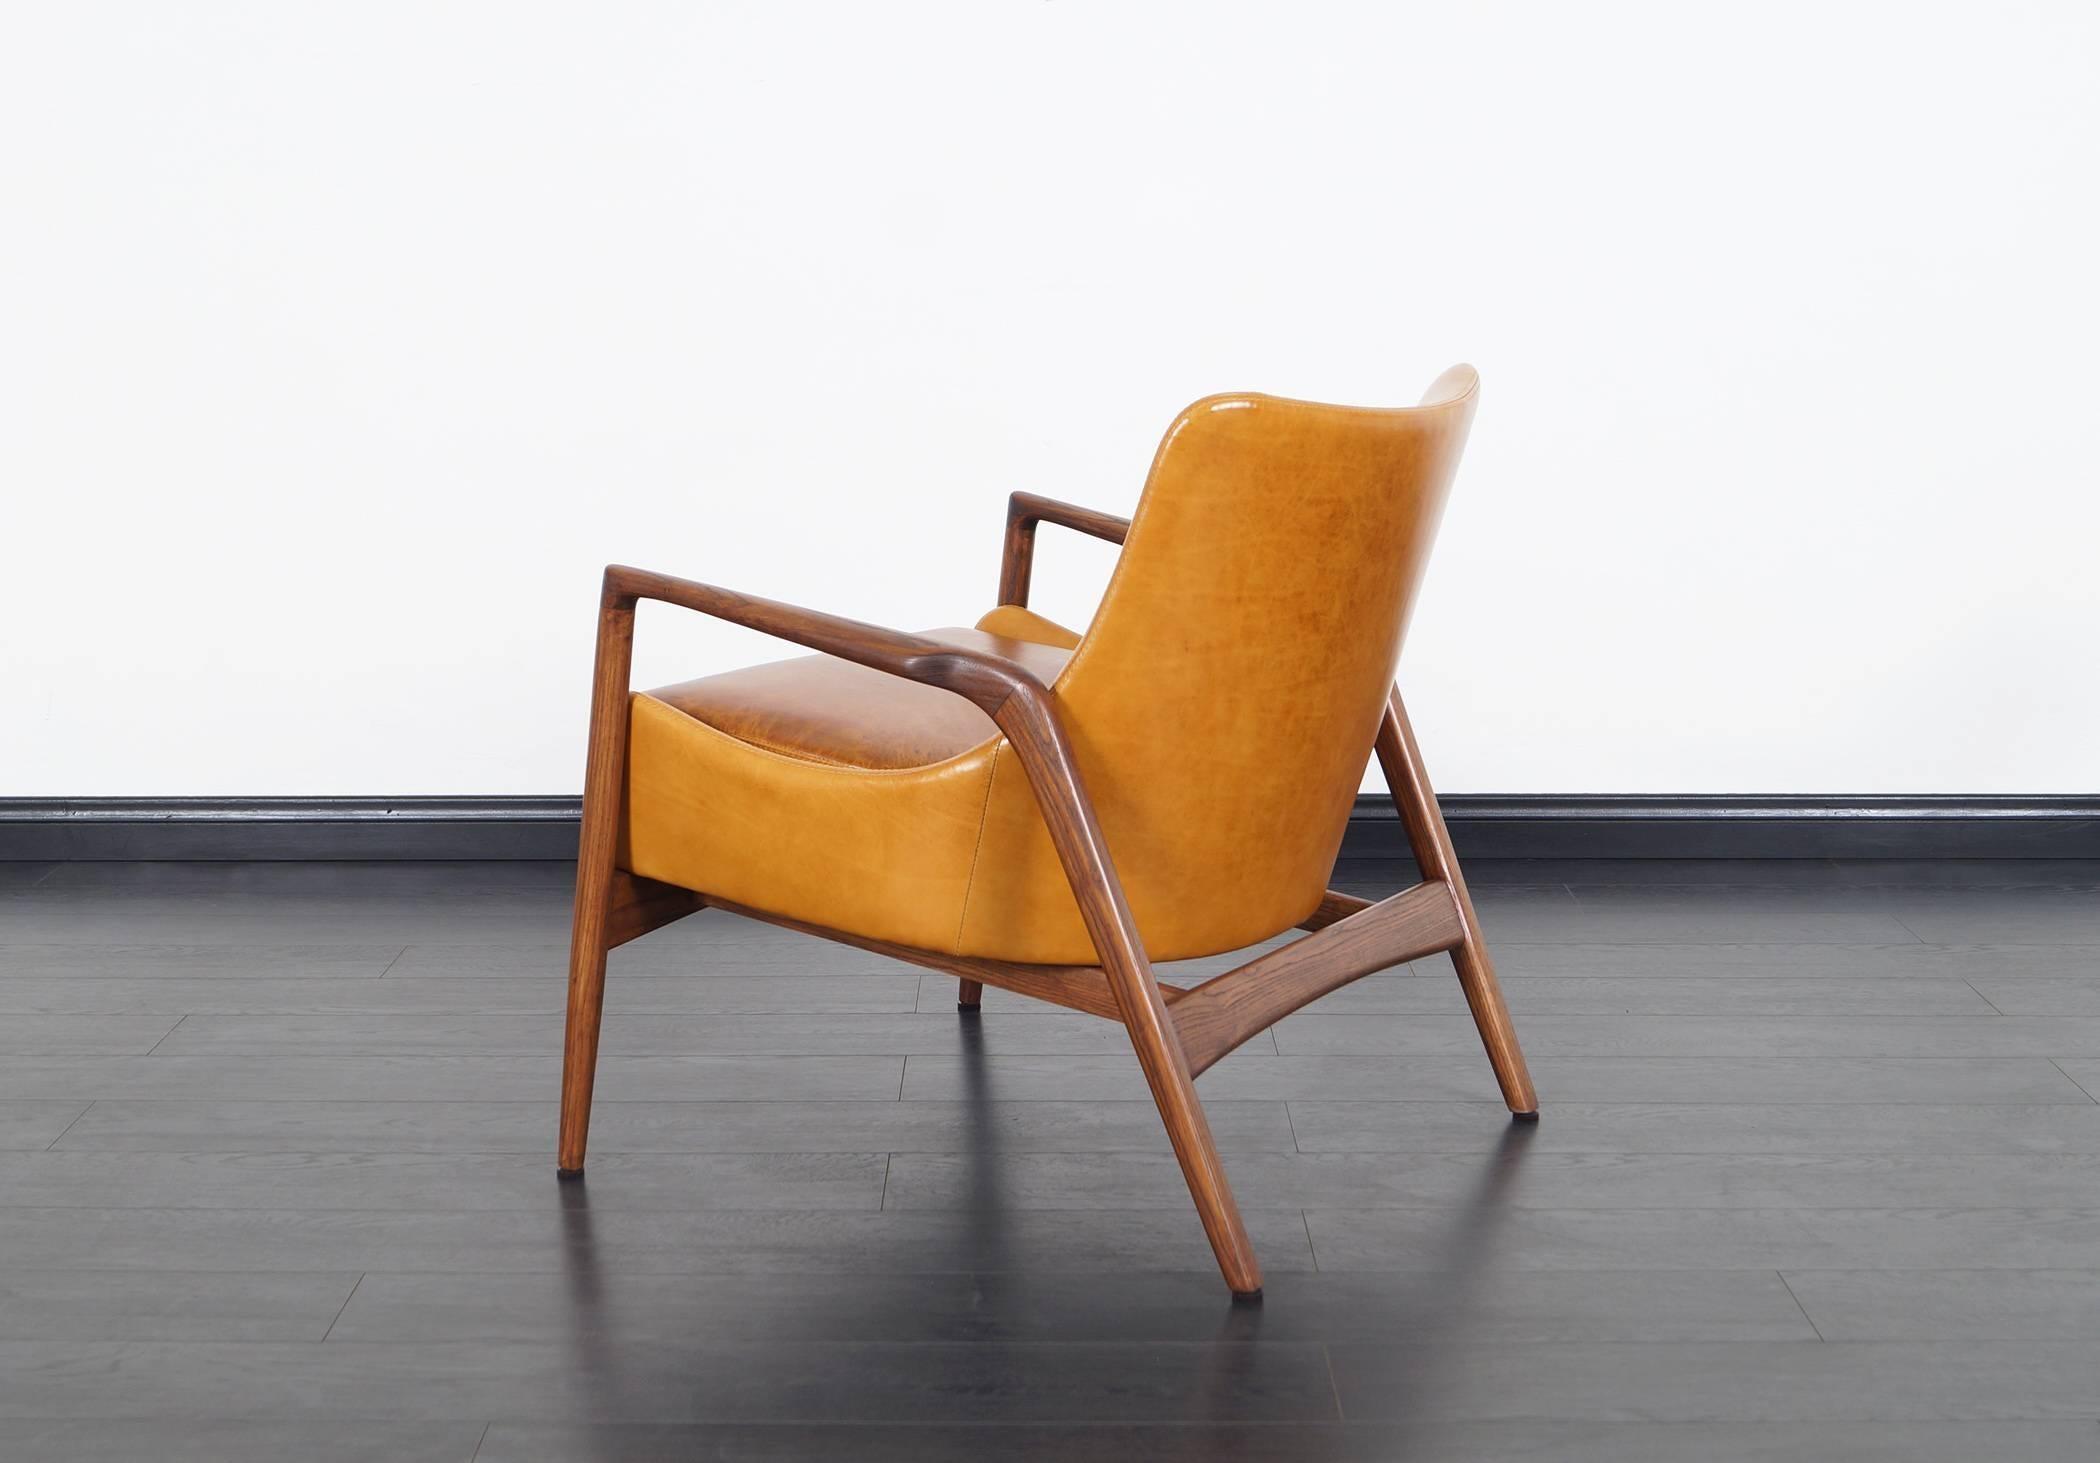 & Danish Modern Leather Lounge Chairs by Ib Kofod Larsen at 1stdibs